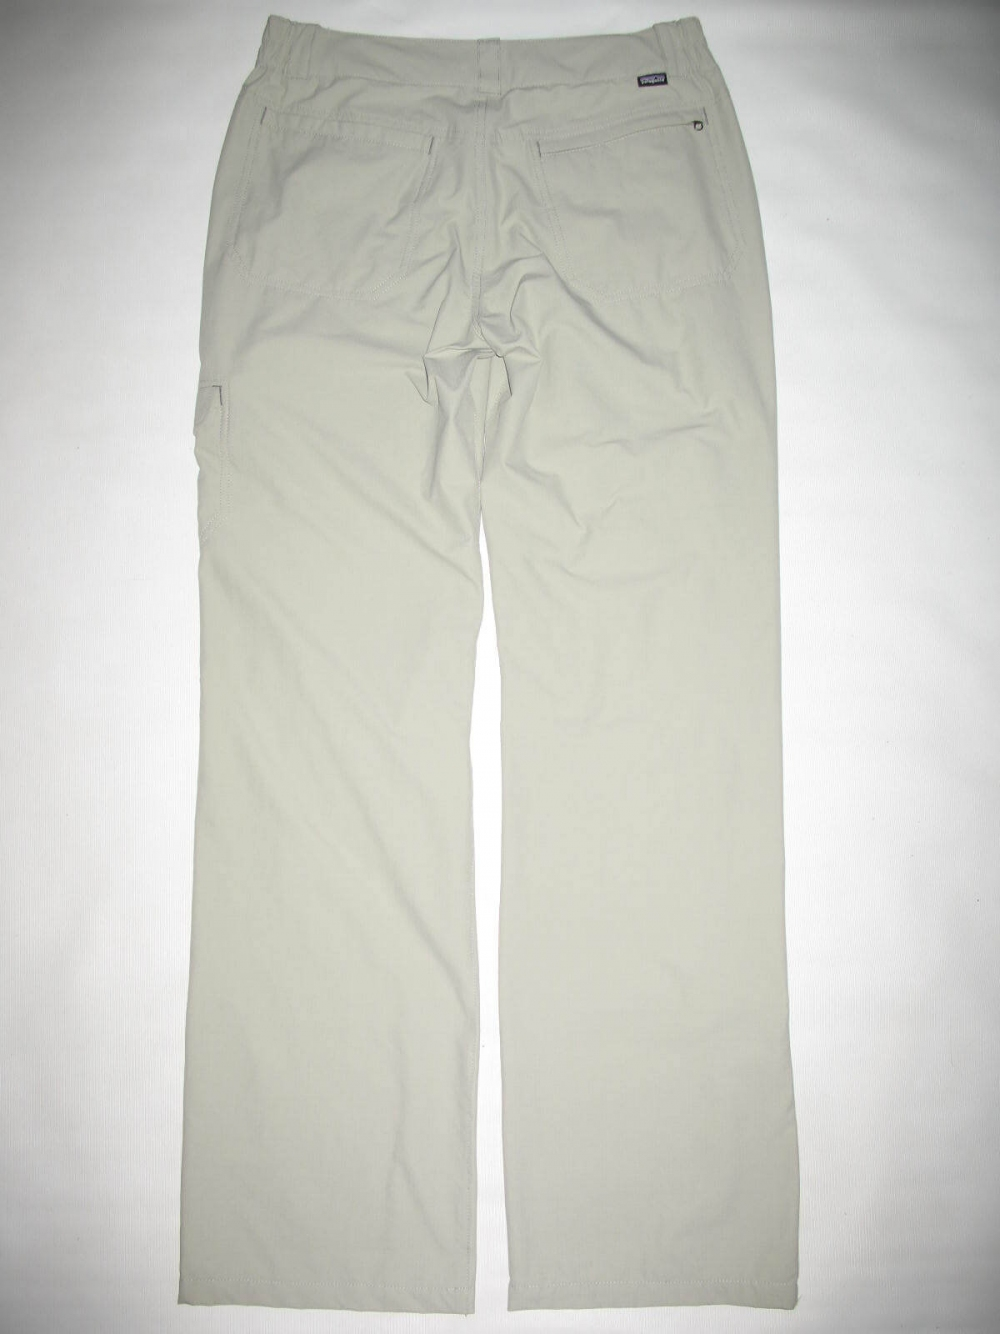 Штаны PATAGONIA nomader pants lady (размер 6-S/M) - 5